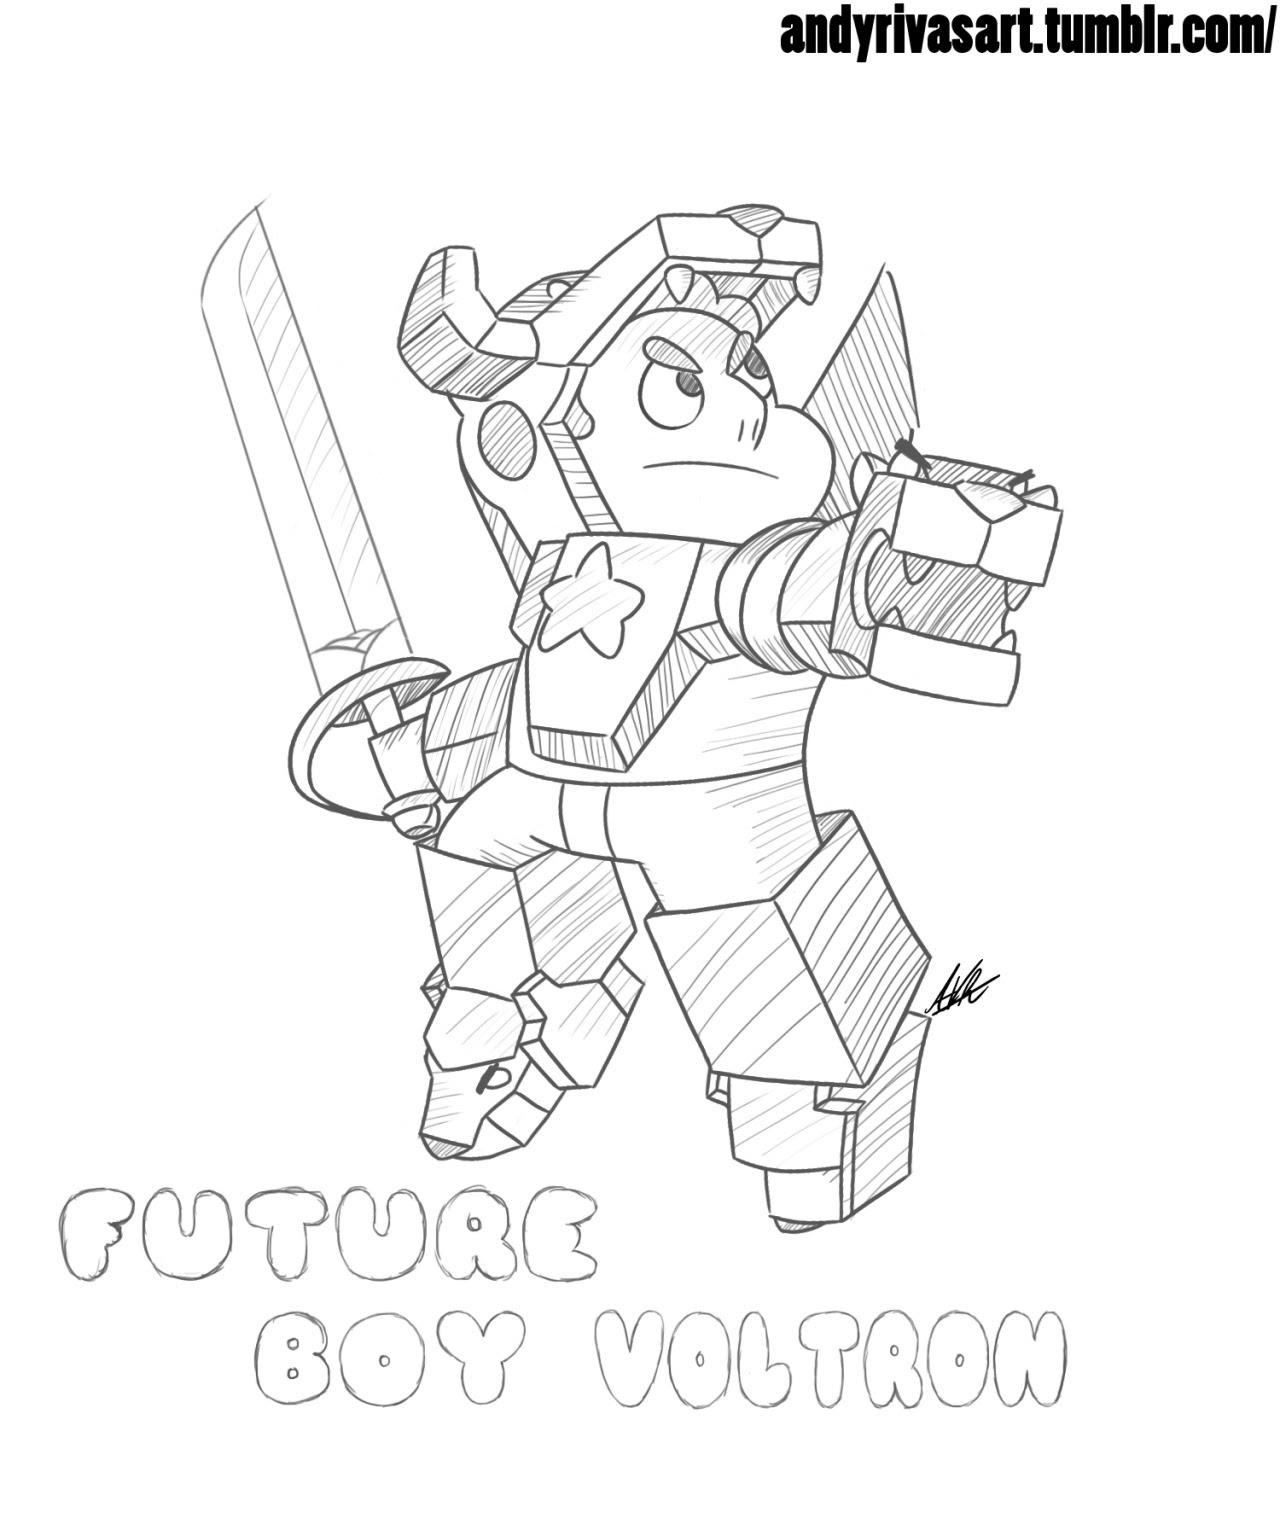 lol ok one more, Future Boy Voltron Zoltron! XD